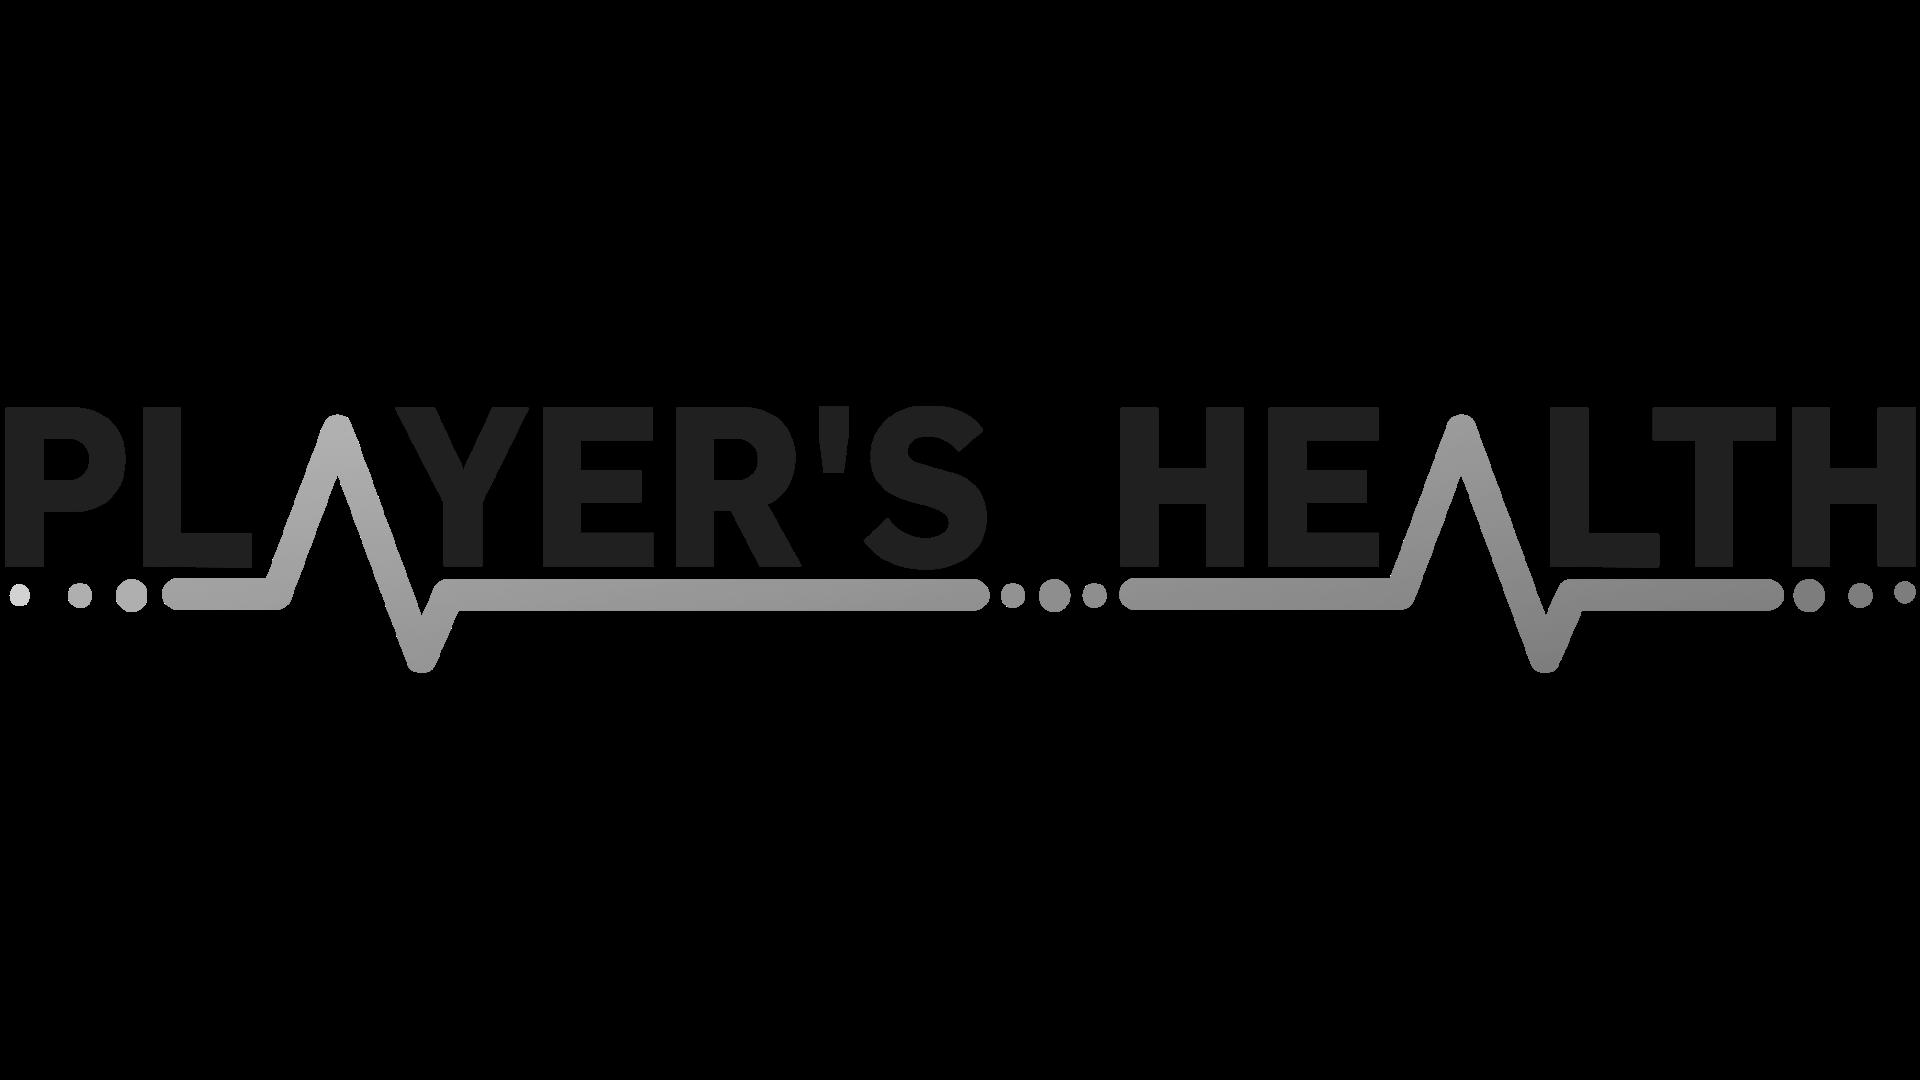 Players Health Insurance